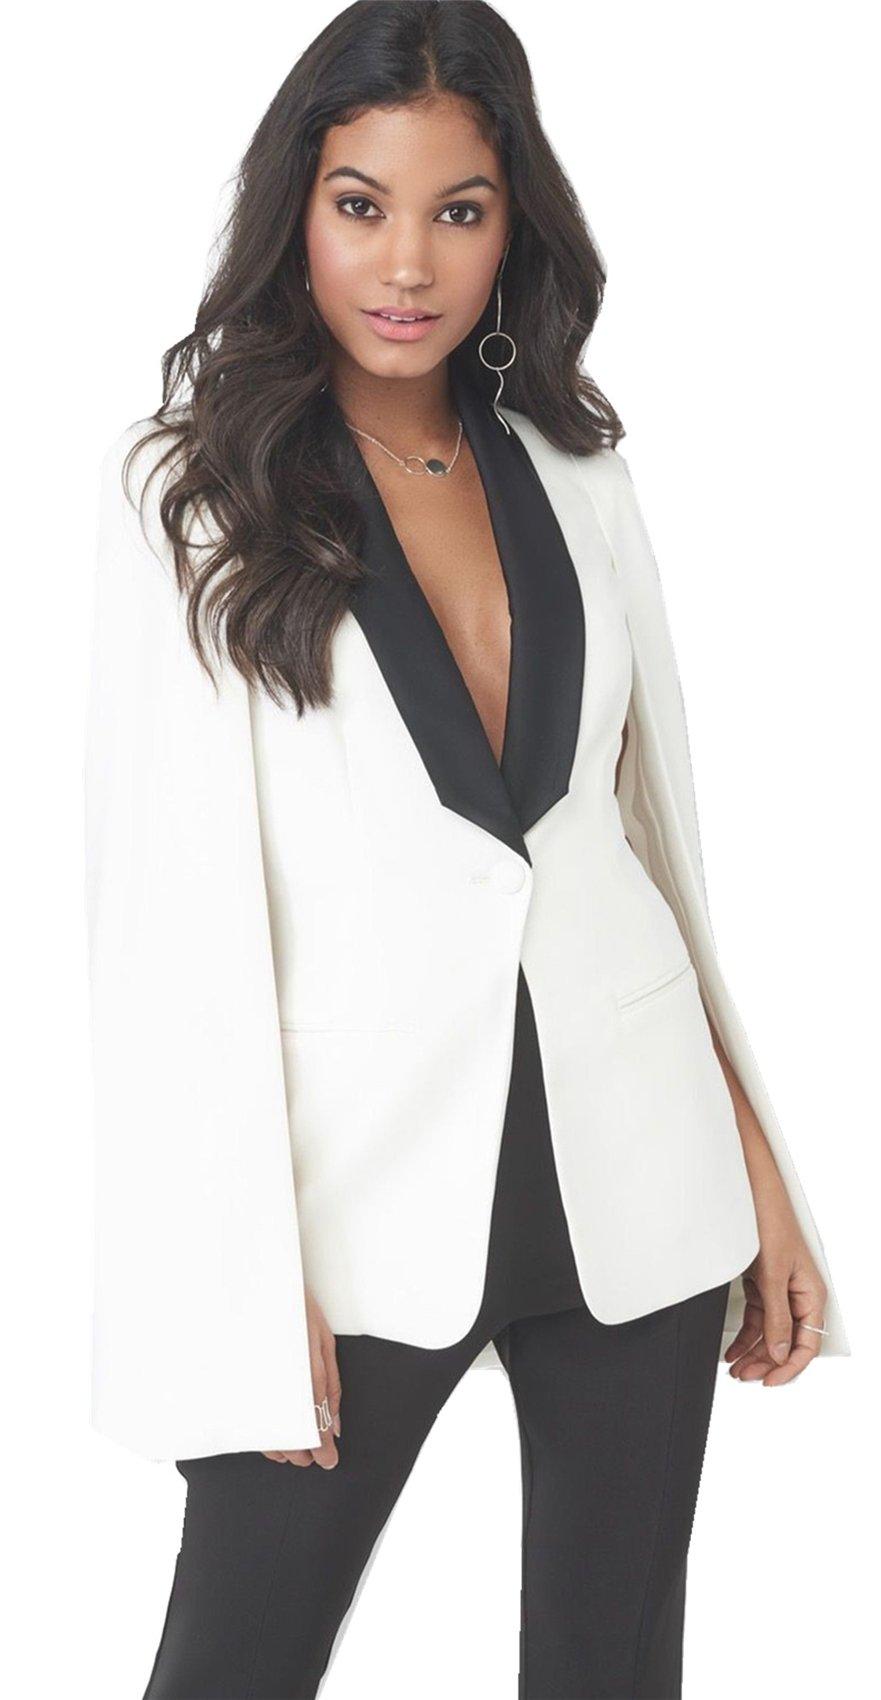 Arctic Cubic Cloak Poncho Cape Style Split Slit Long Sleeve Deep V Neck One Button Pocket Colorblock Blazer Jacket Top White S